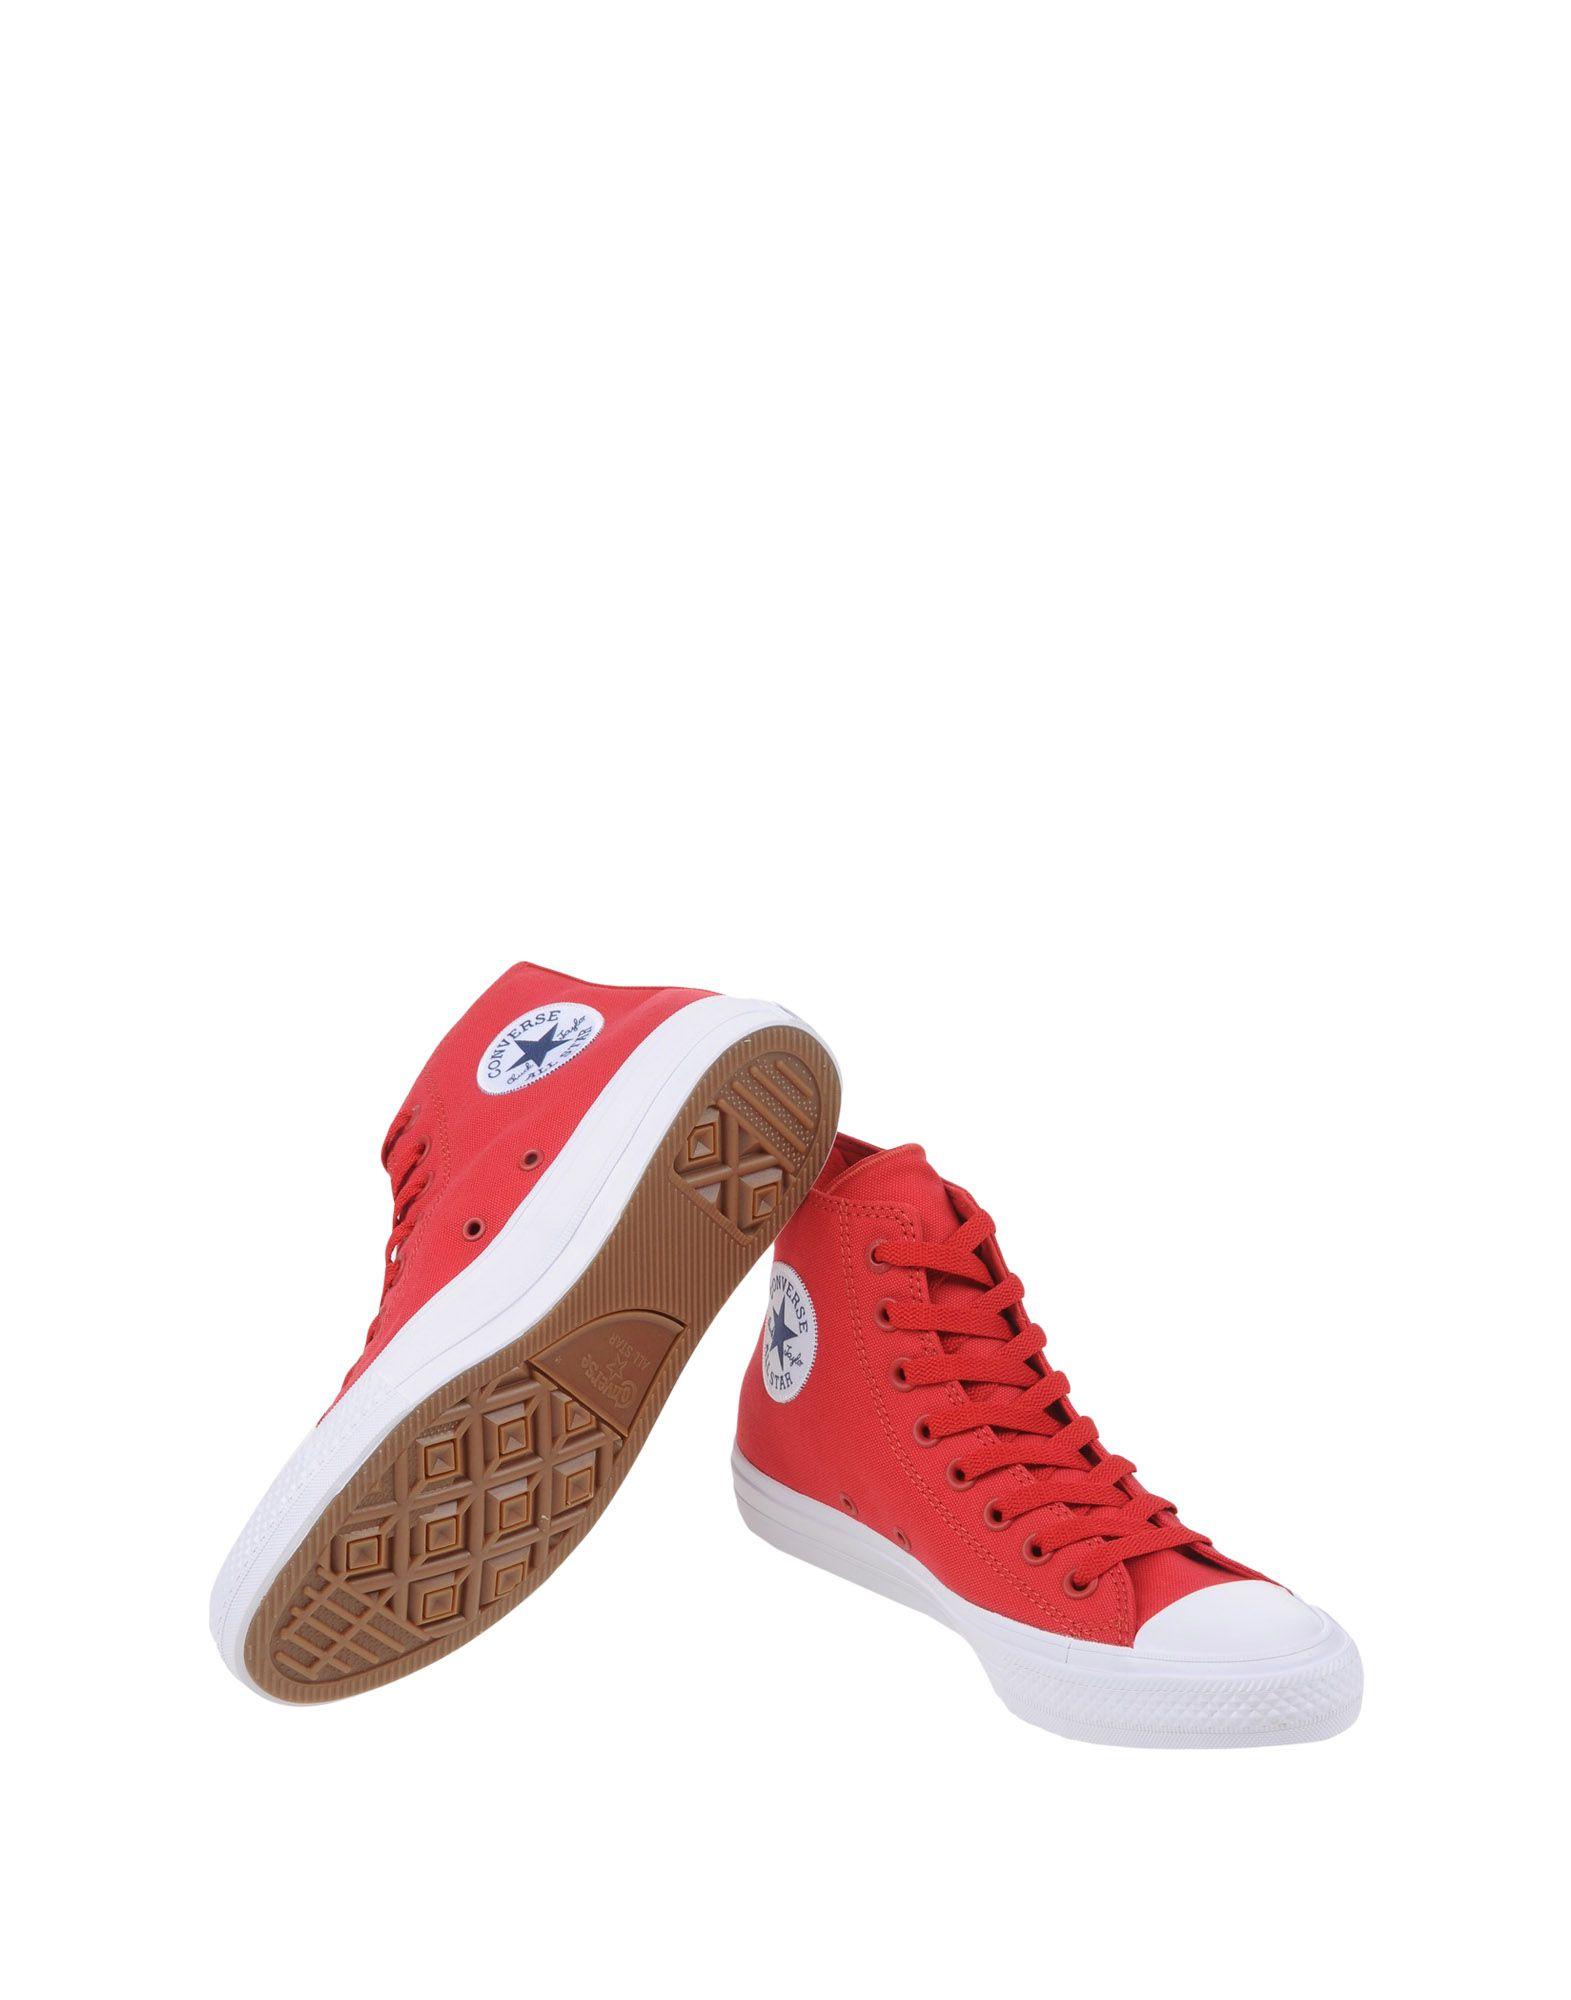 Sneakers Converse All Star Ct As Ii Hi Tencel Canvas - Femme - Sneakers Converse All Star sur